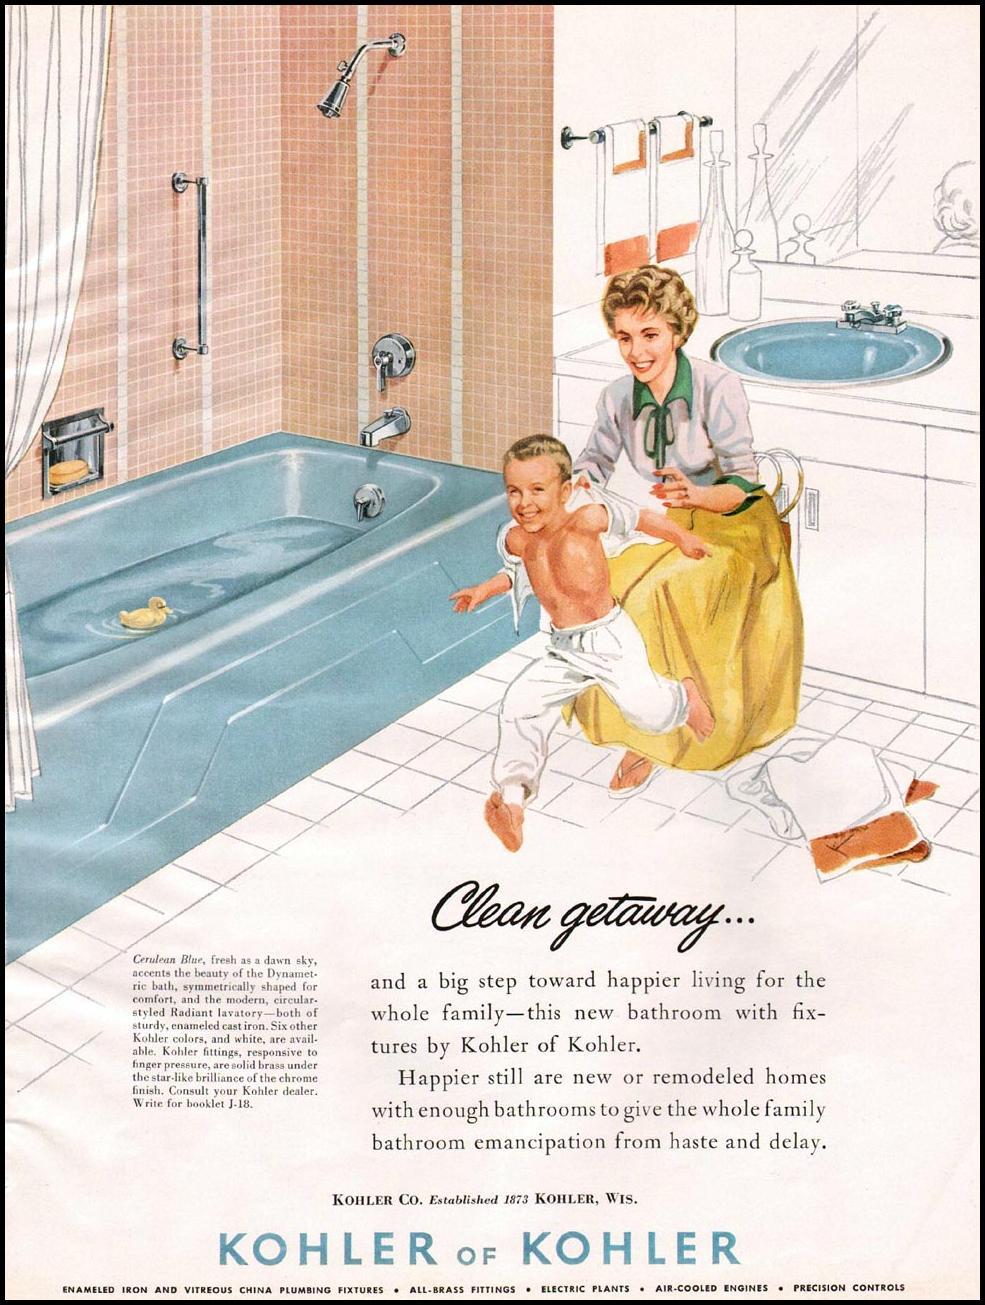 KOHLER BATHROOM FIXTURES BETTER HOMES AND GARDENS 03/01/1960